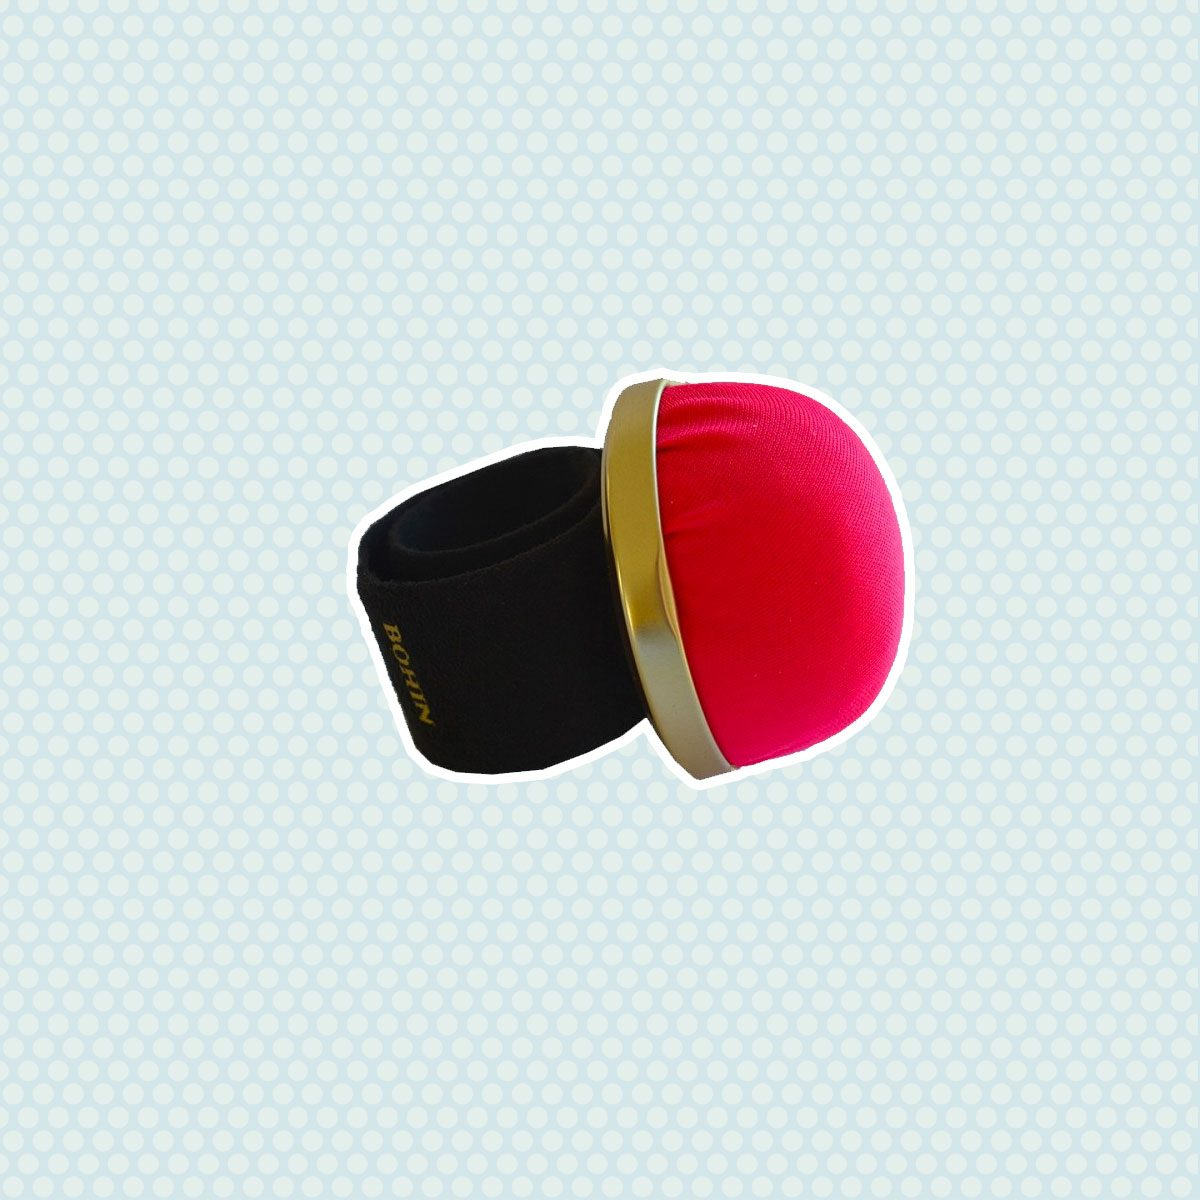 Bohin Pin Cushion with Adjustable Snap Bracelet